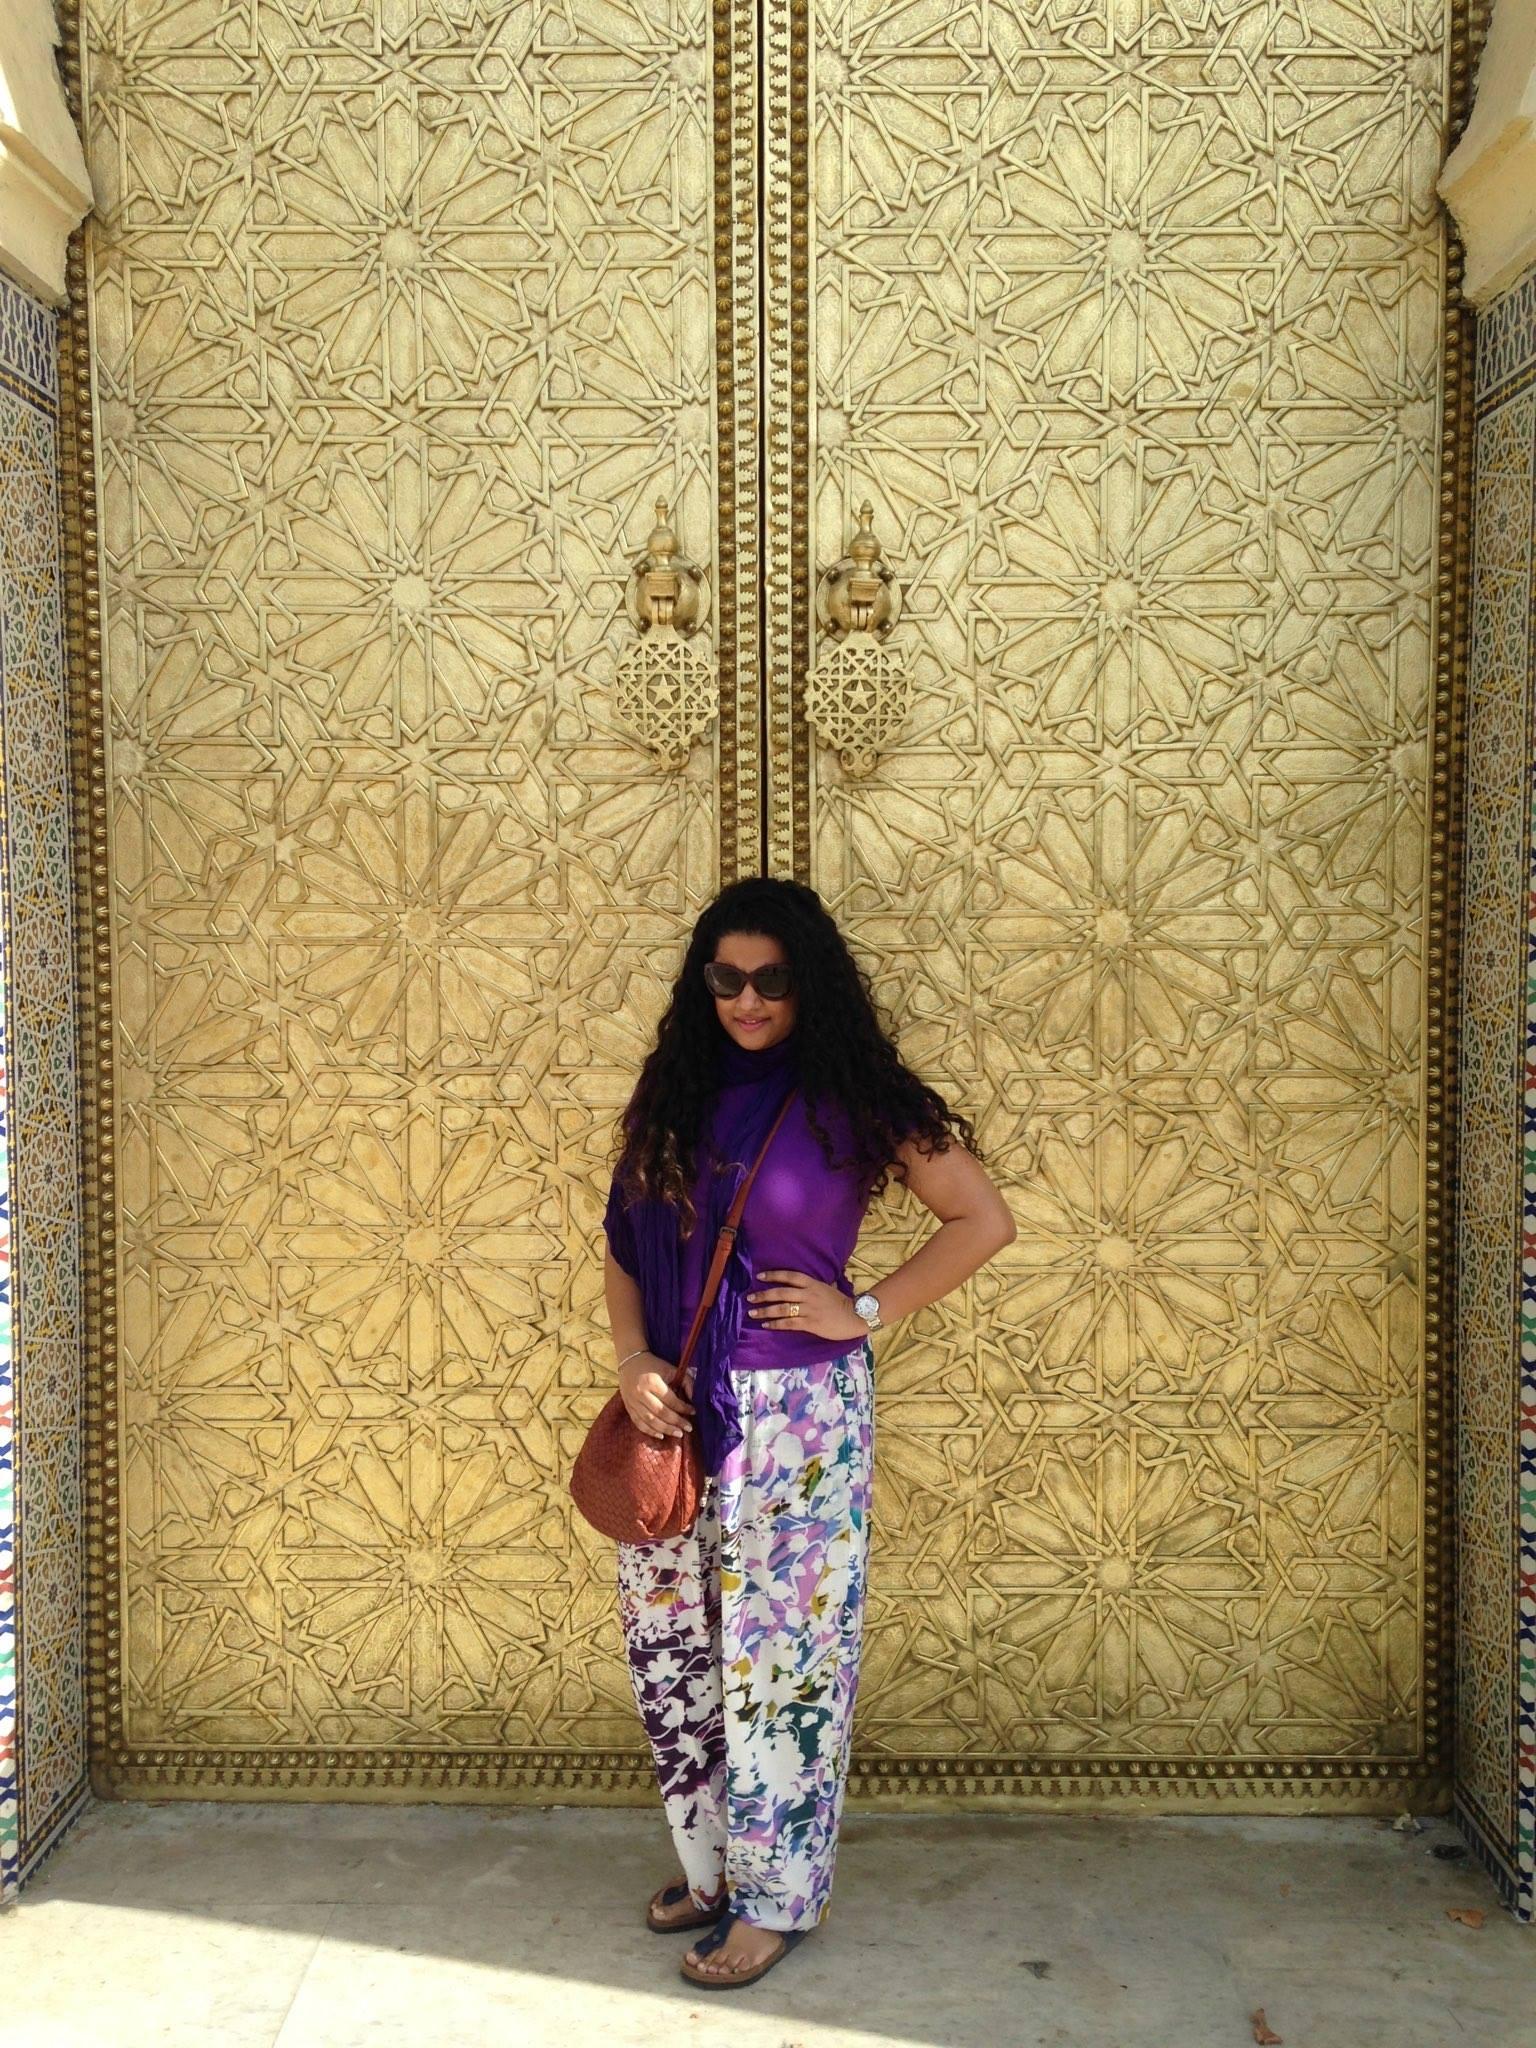 Fes   Ralph Lauren T-shirt, Pashma Pants, Scarf from Koovs.com ,Birkenstock Sandals, Bottega Veneta Sling, Dior Sunglasses